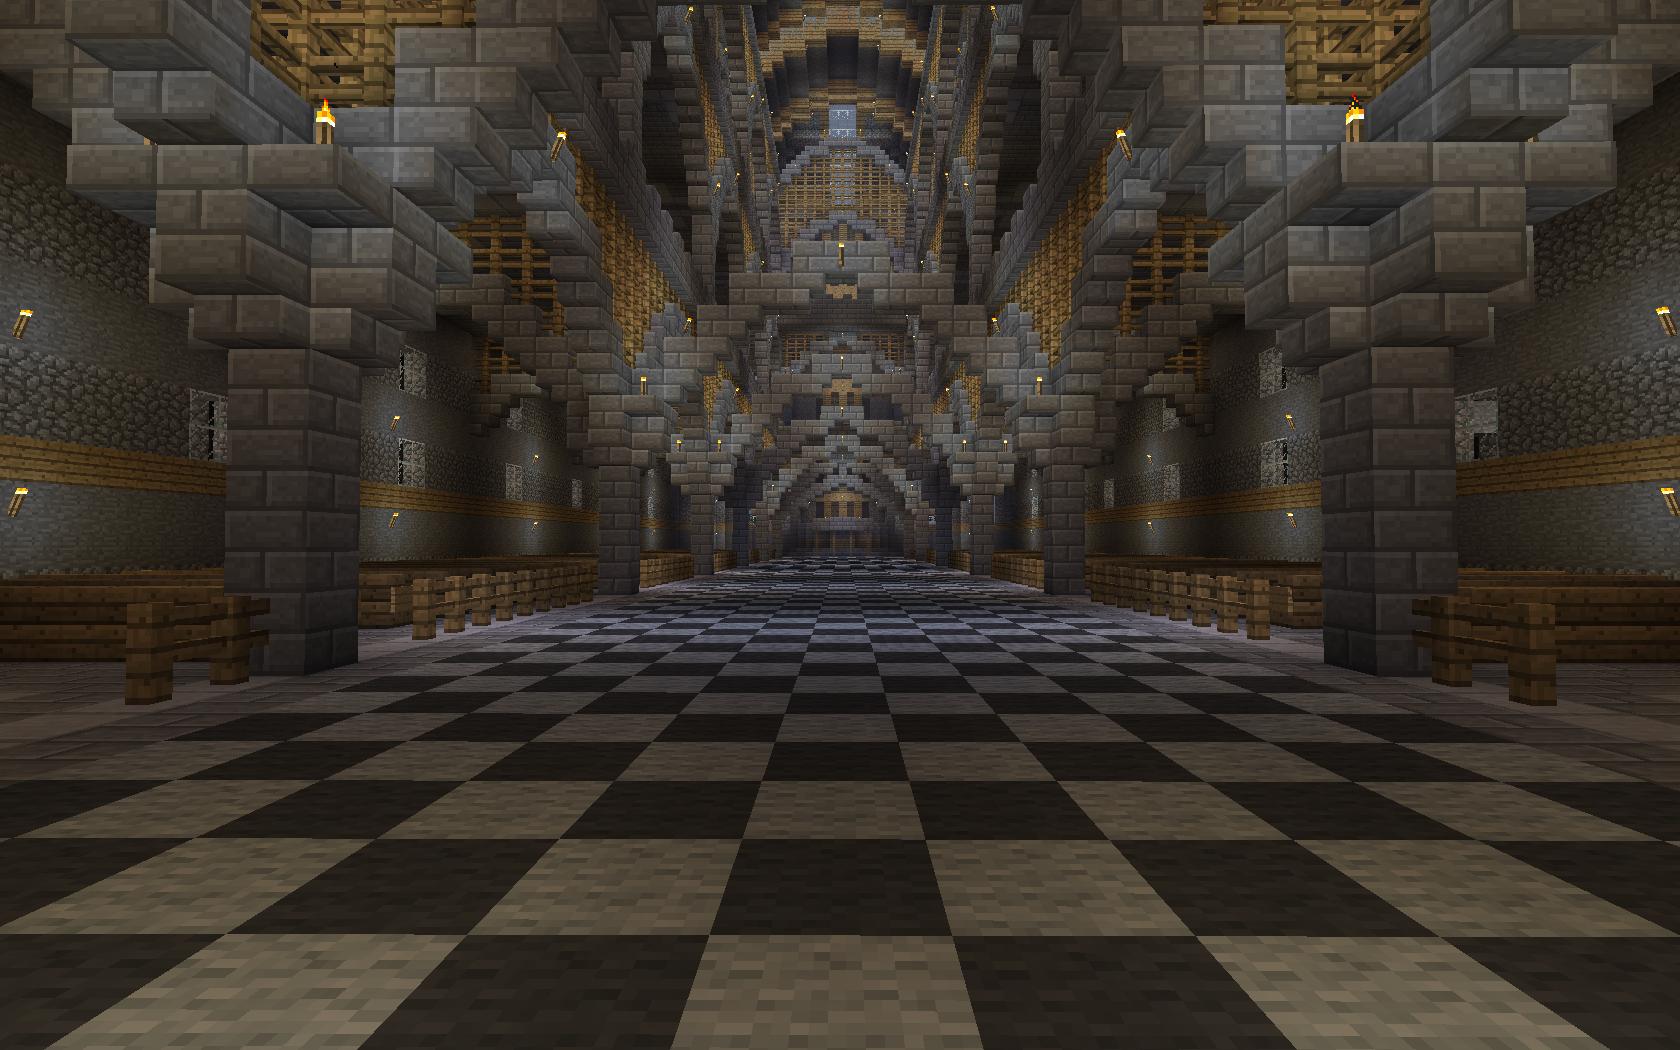 Minecraft Cathedral Interior Google Search Minecraft